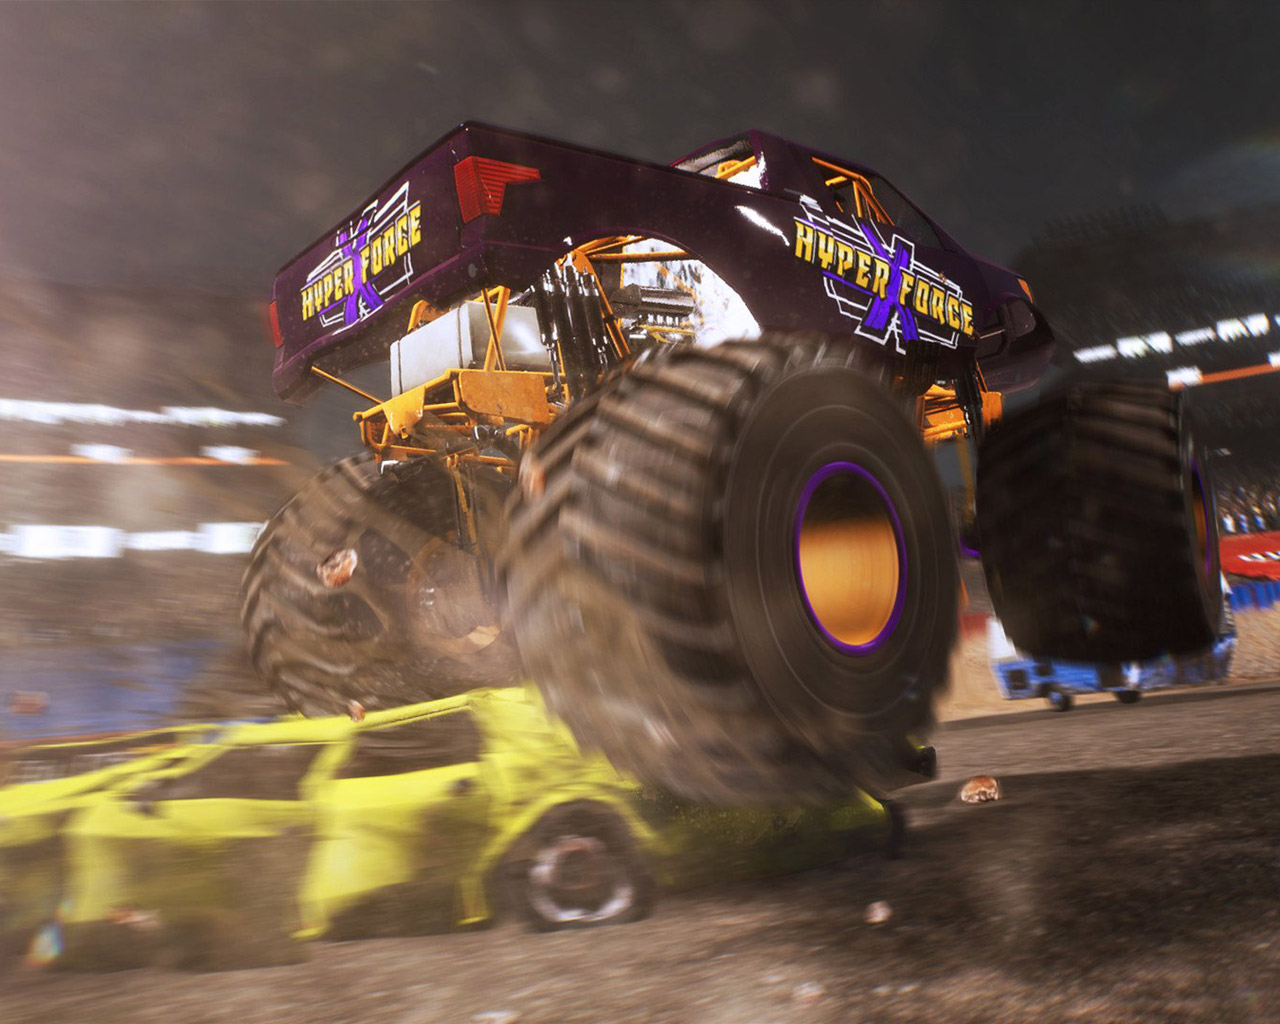 Free Monster Truck Championship Wallpaper in 1280x1024